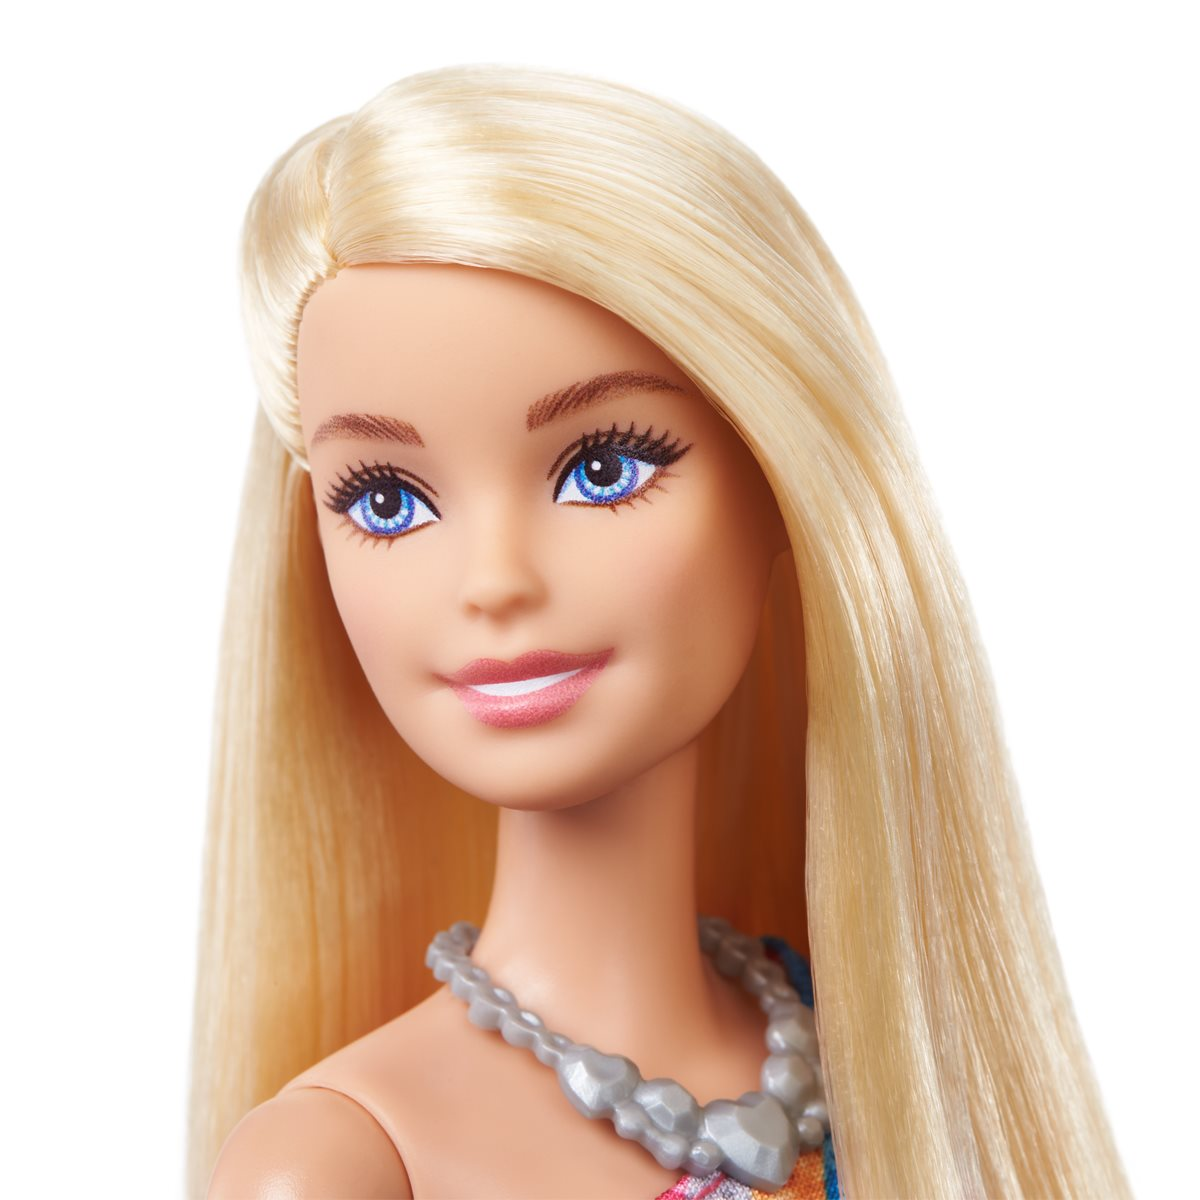 Barbie Big City Big Dreams Malibu Doll face